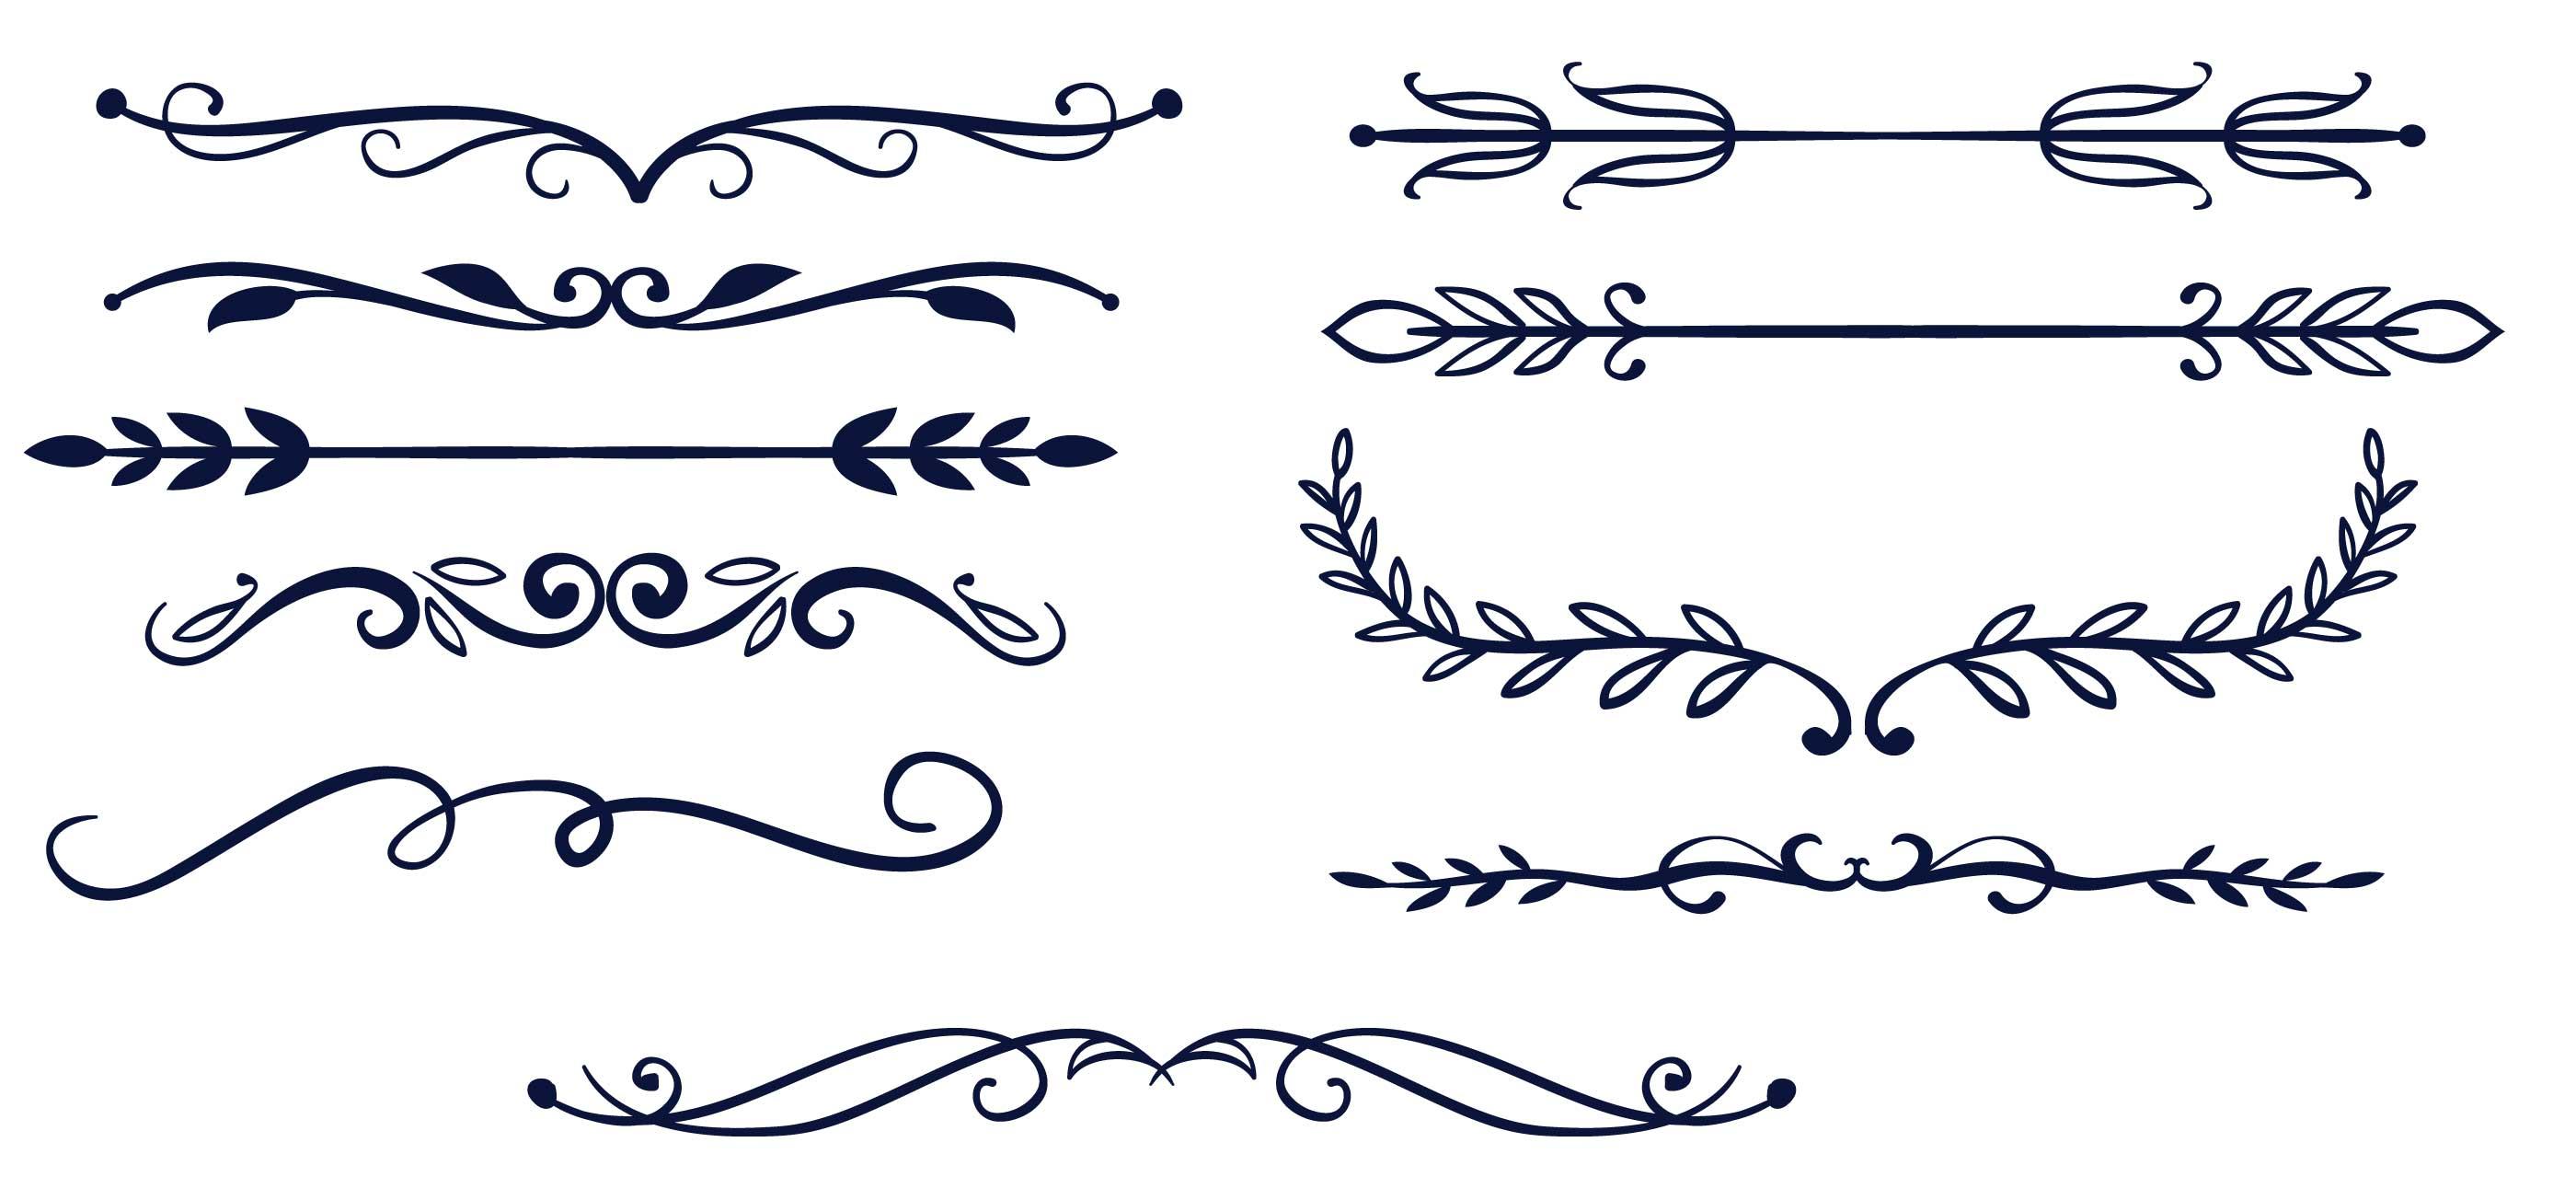 Simple Vector Line Art : Free simple dividers vectors download vector art